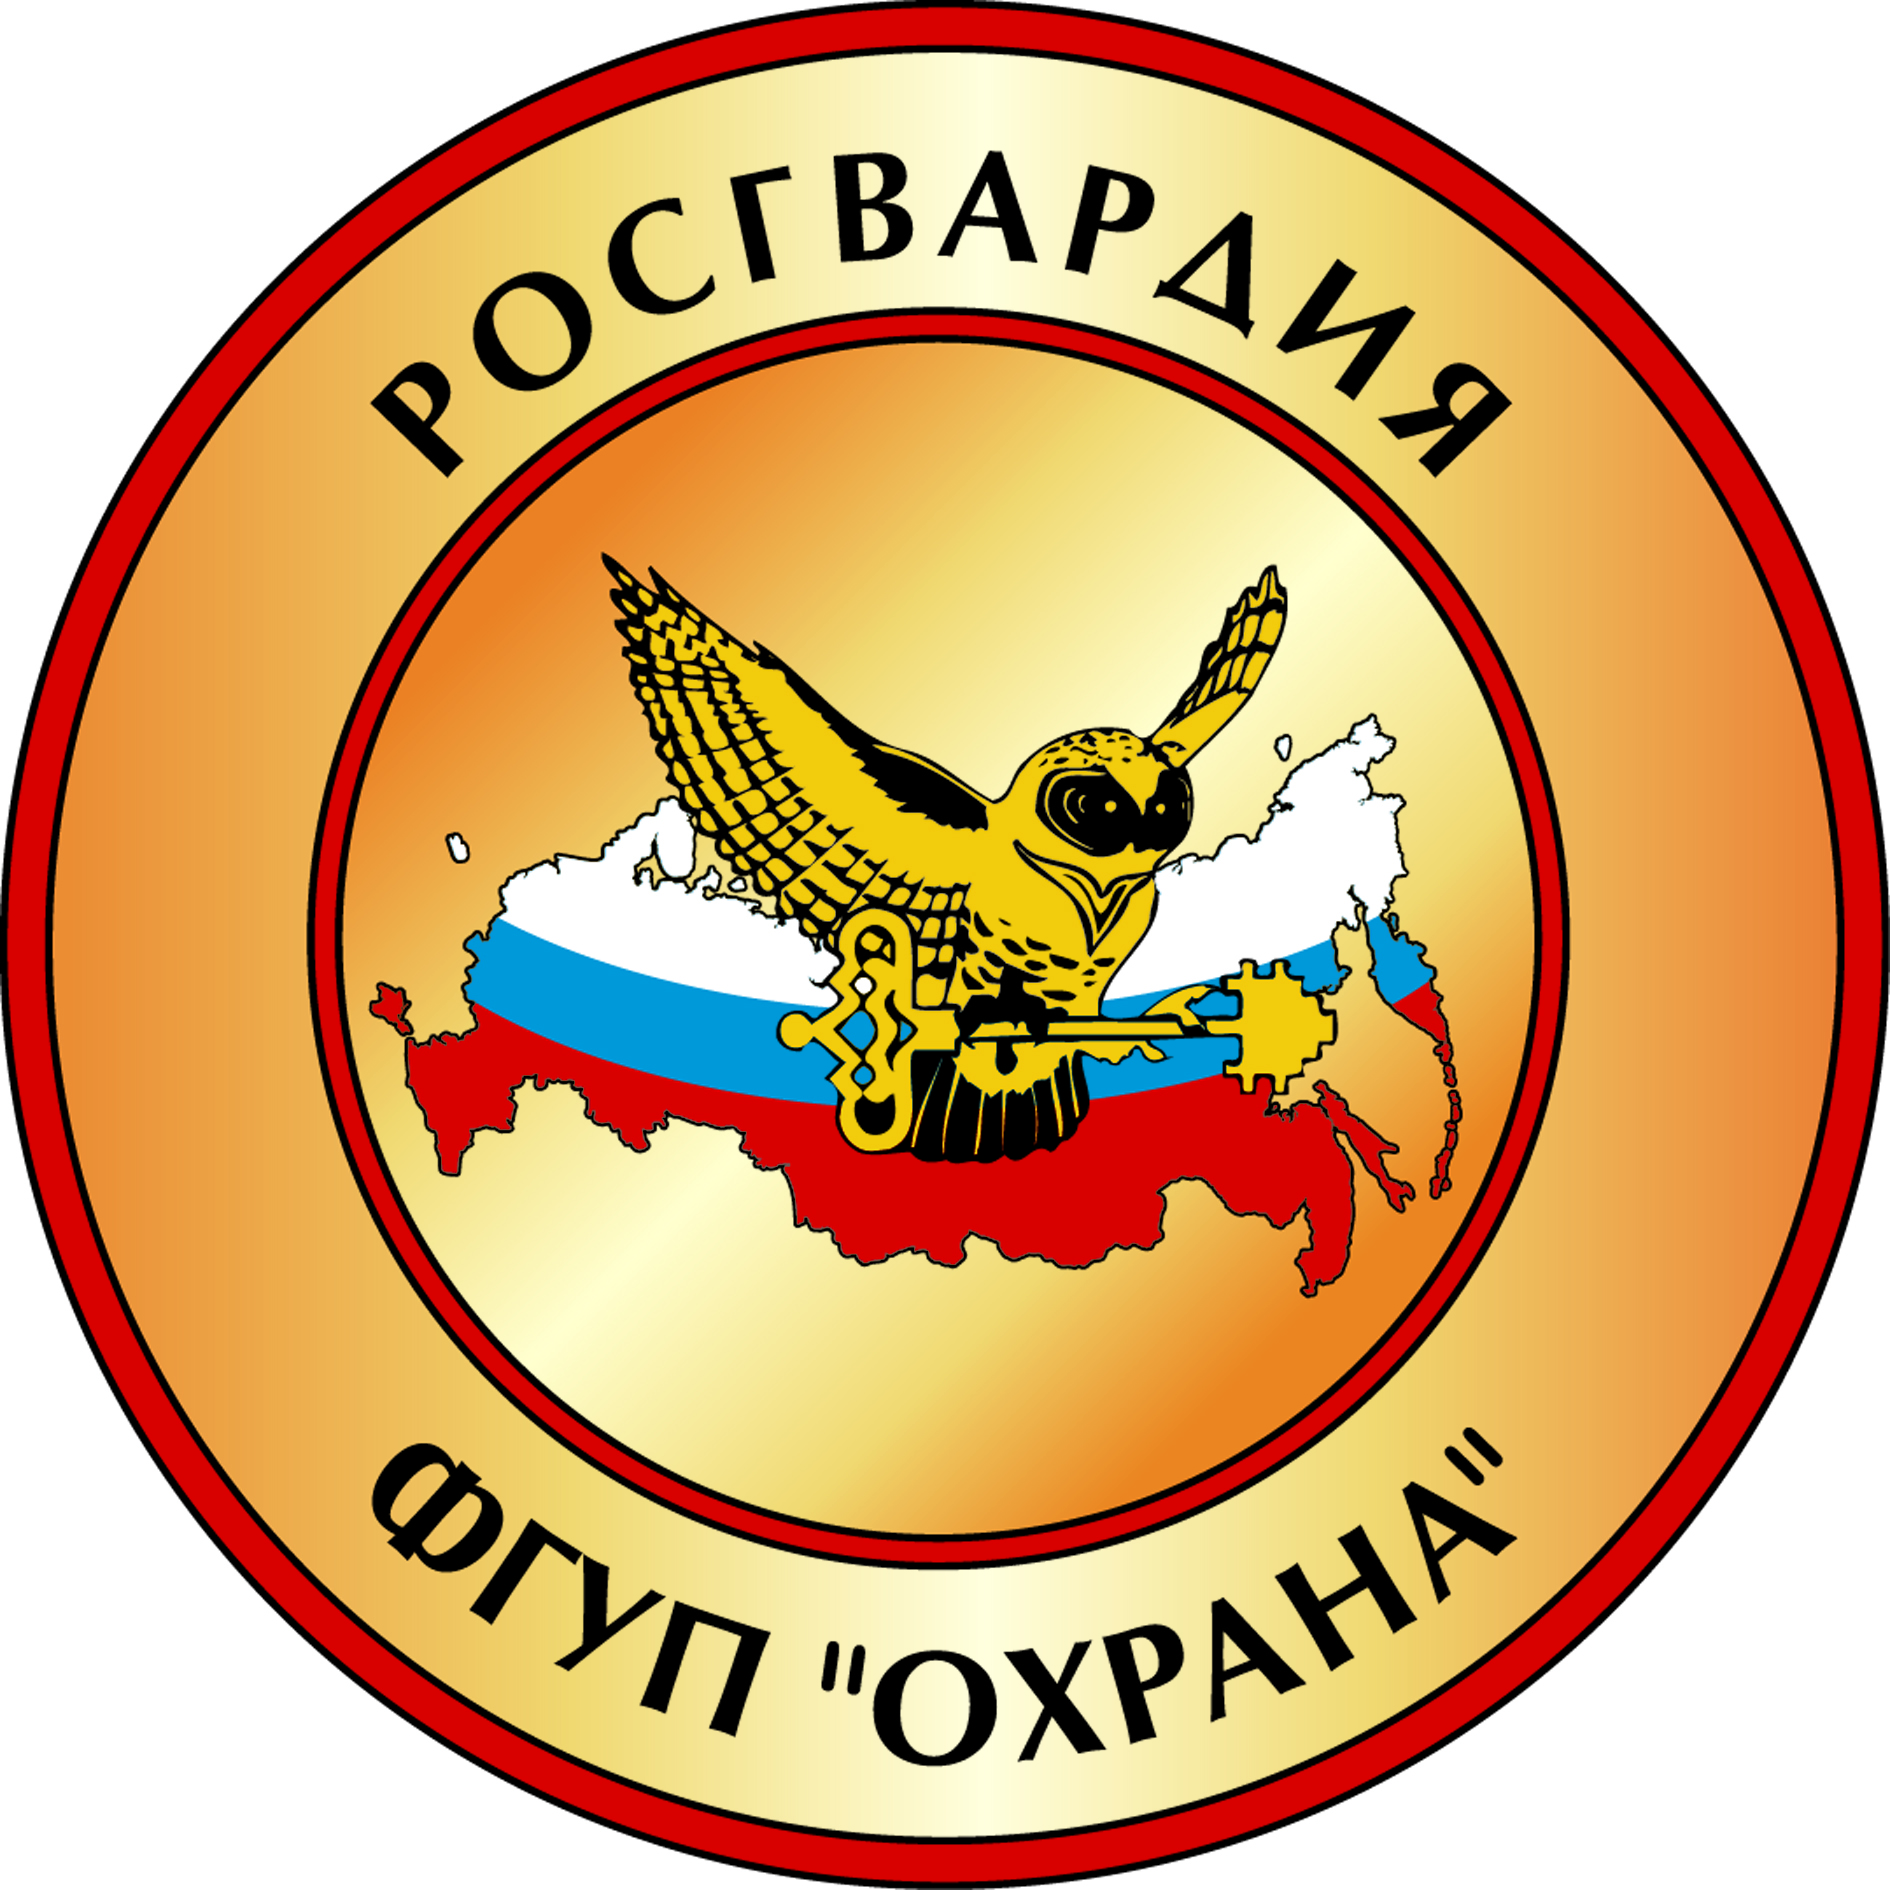 ФГУП «Охрана» Росгвардии